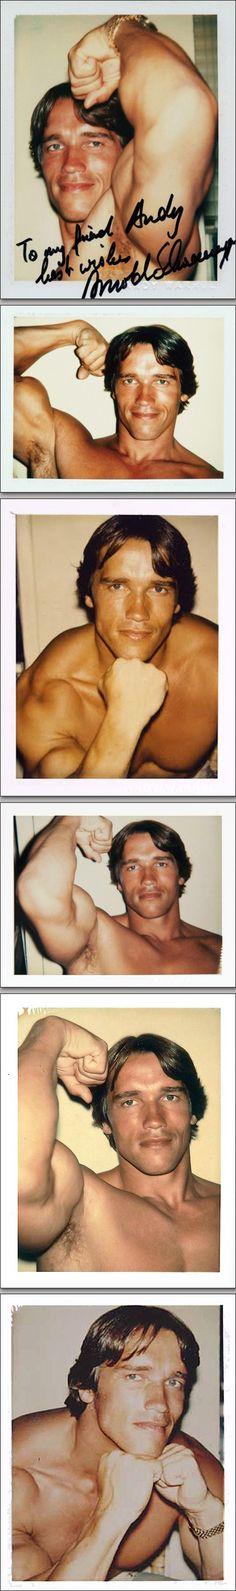 Arnold Schwartzenegger Polaroids by Andy Warhol, 1977